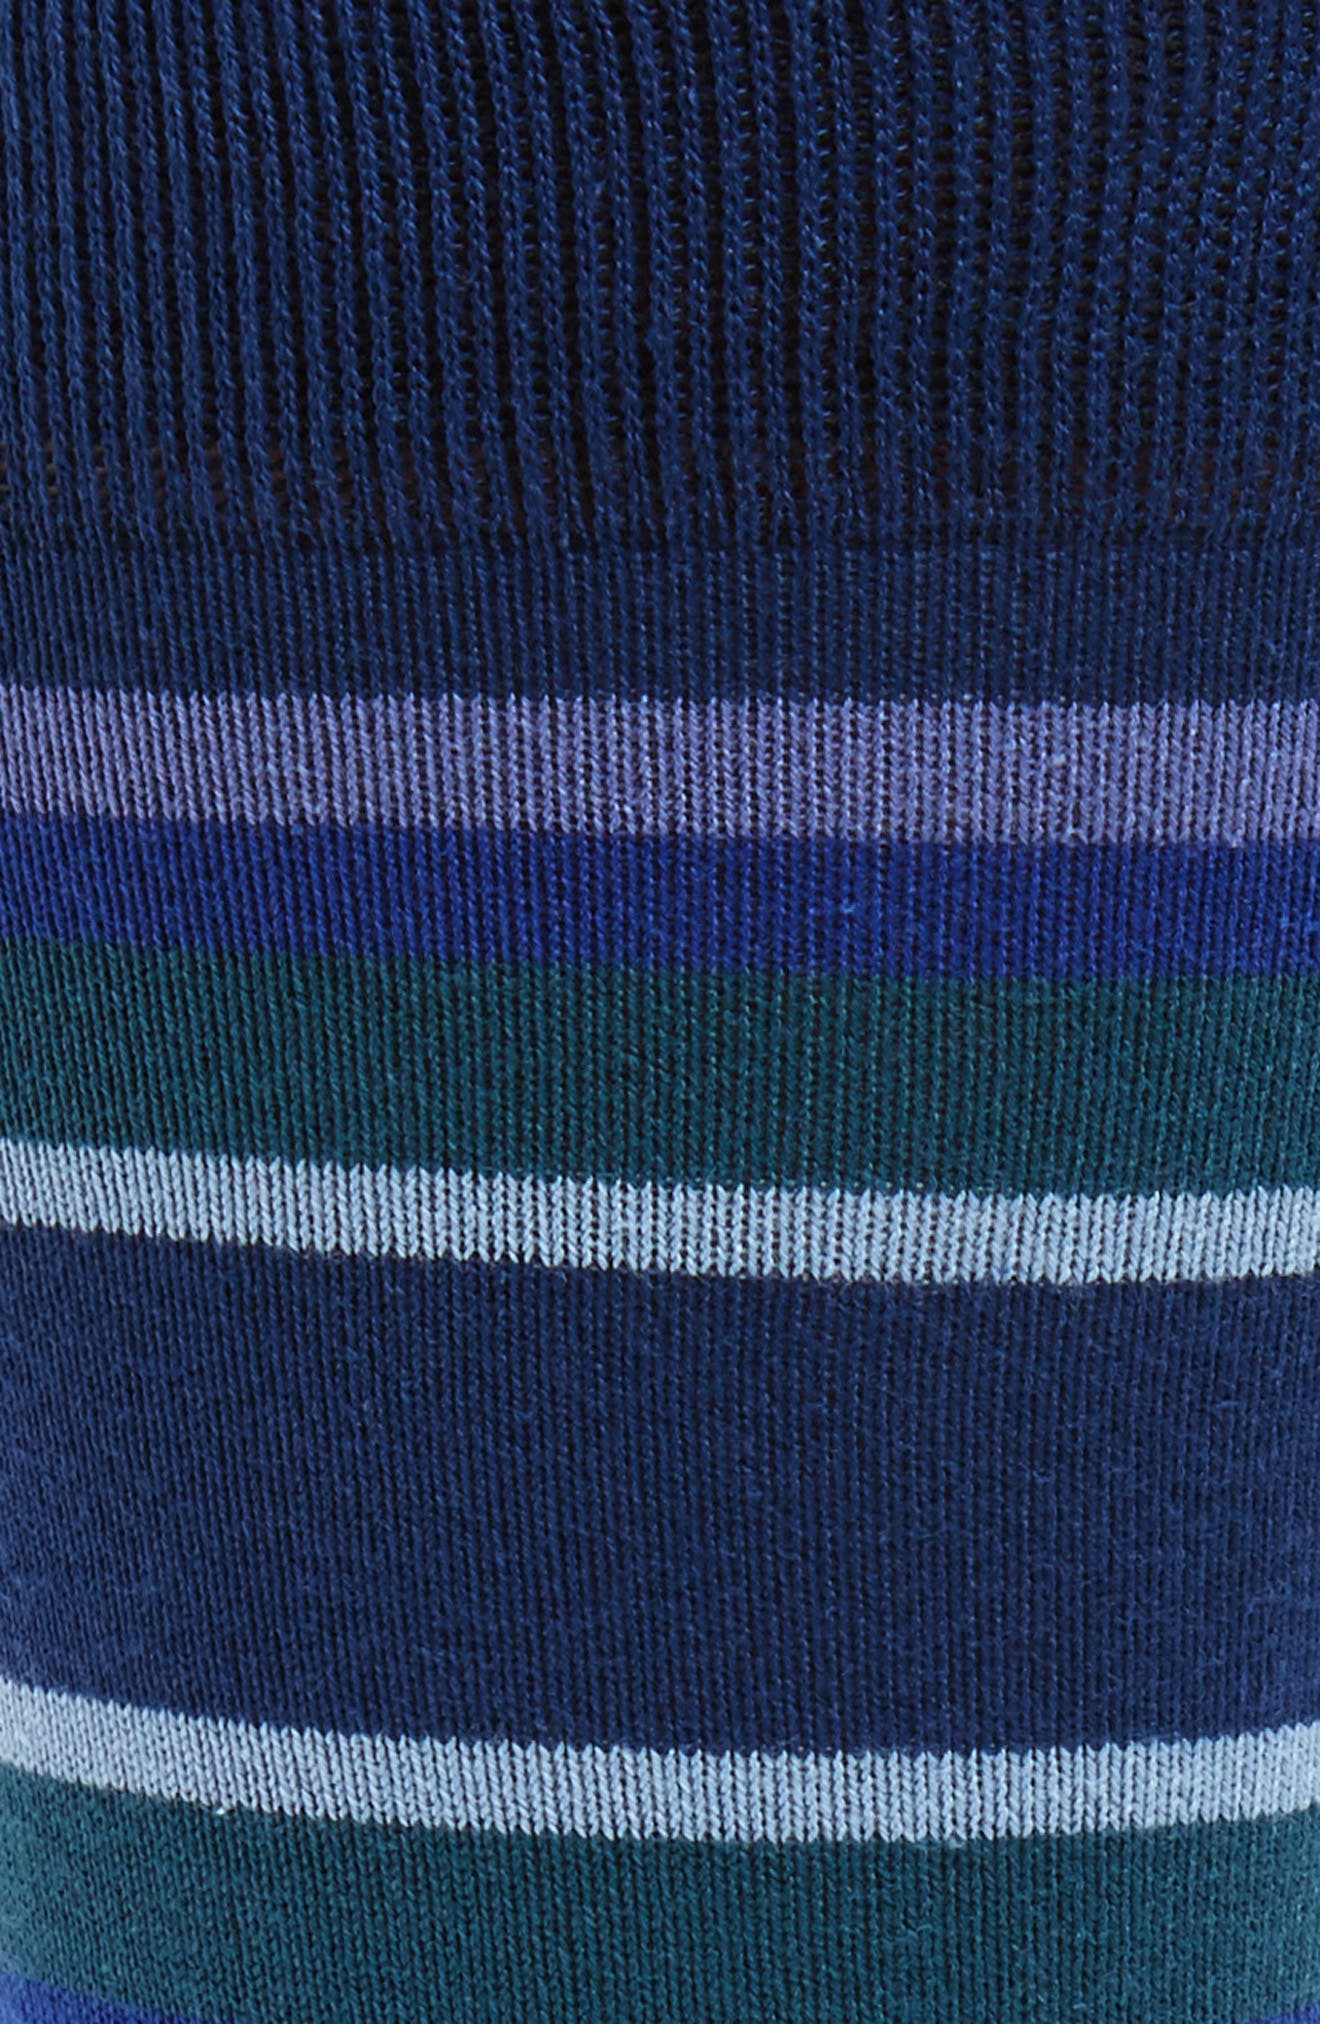 Lawn Stripe Socks,                             Alternate thumbnail 2, color,                             400